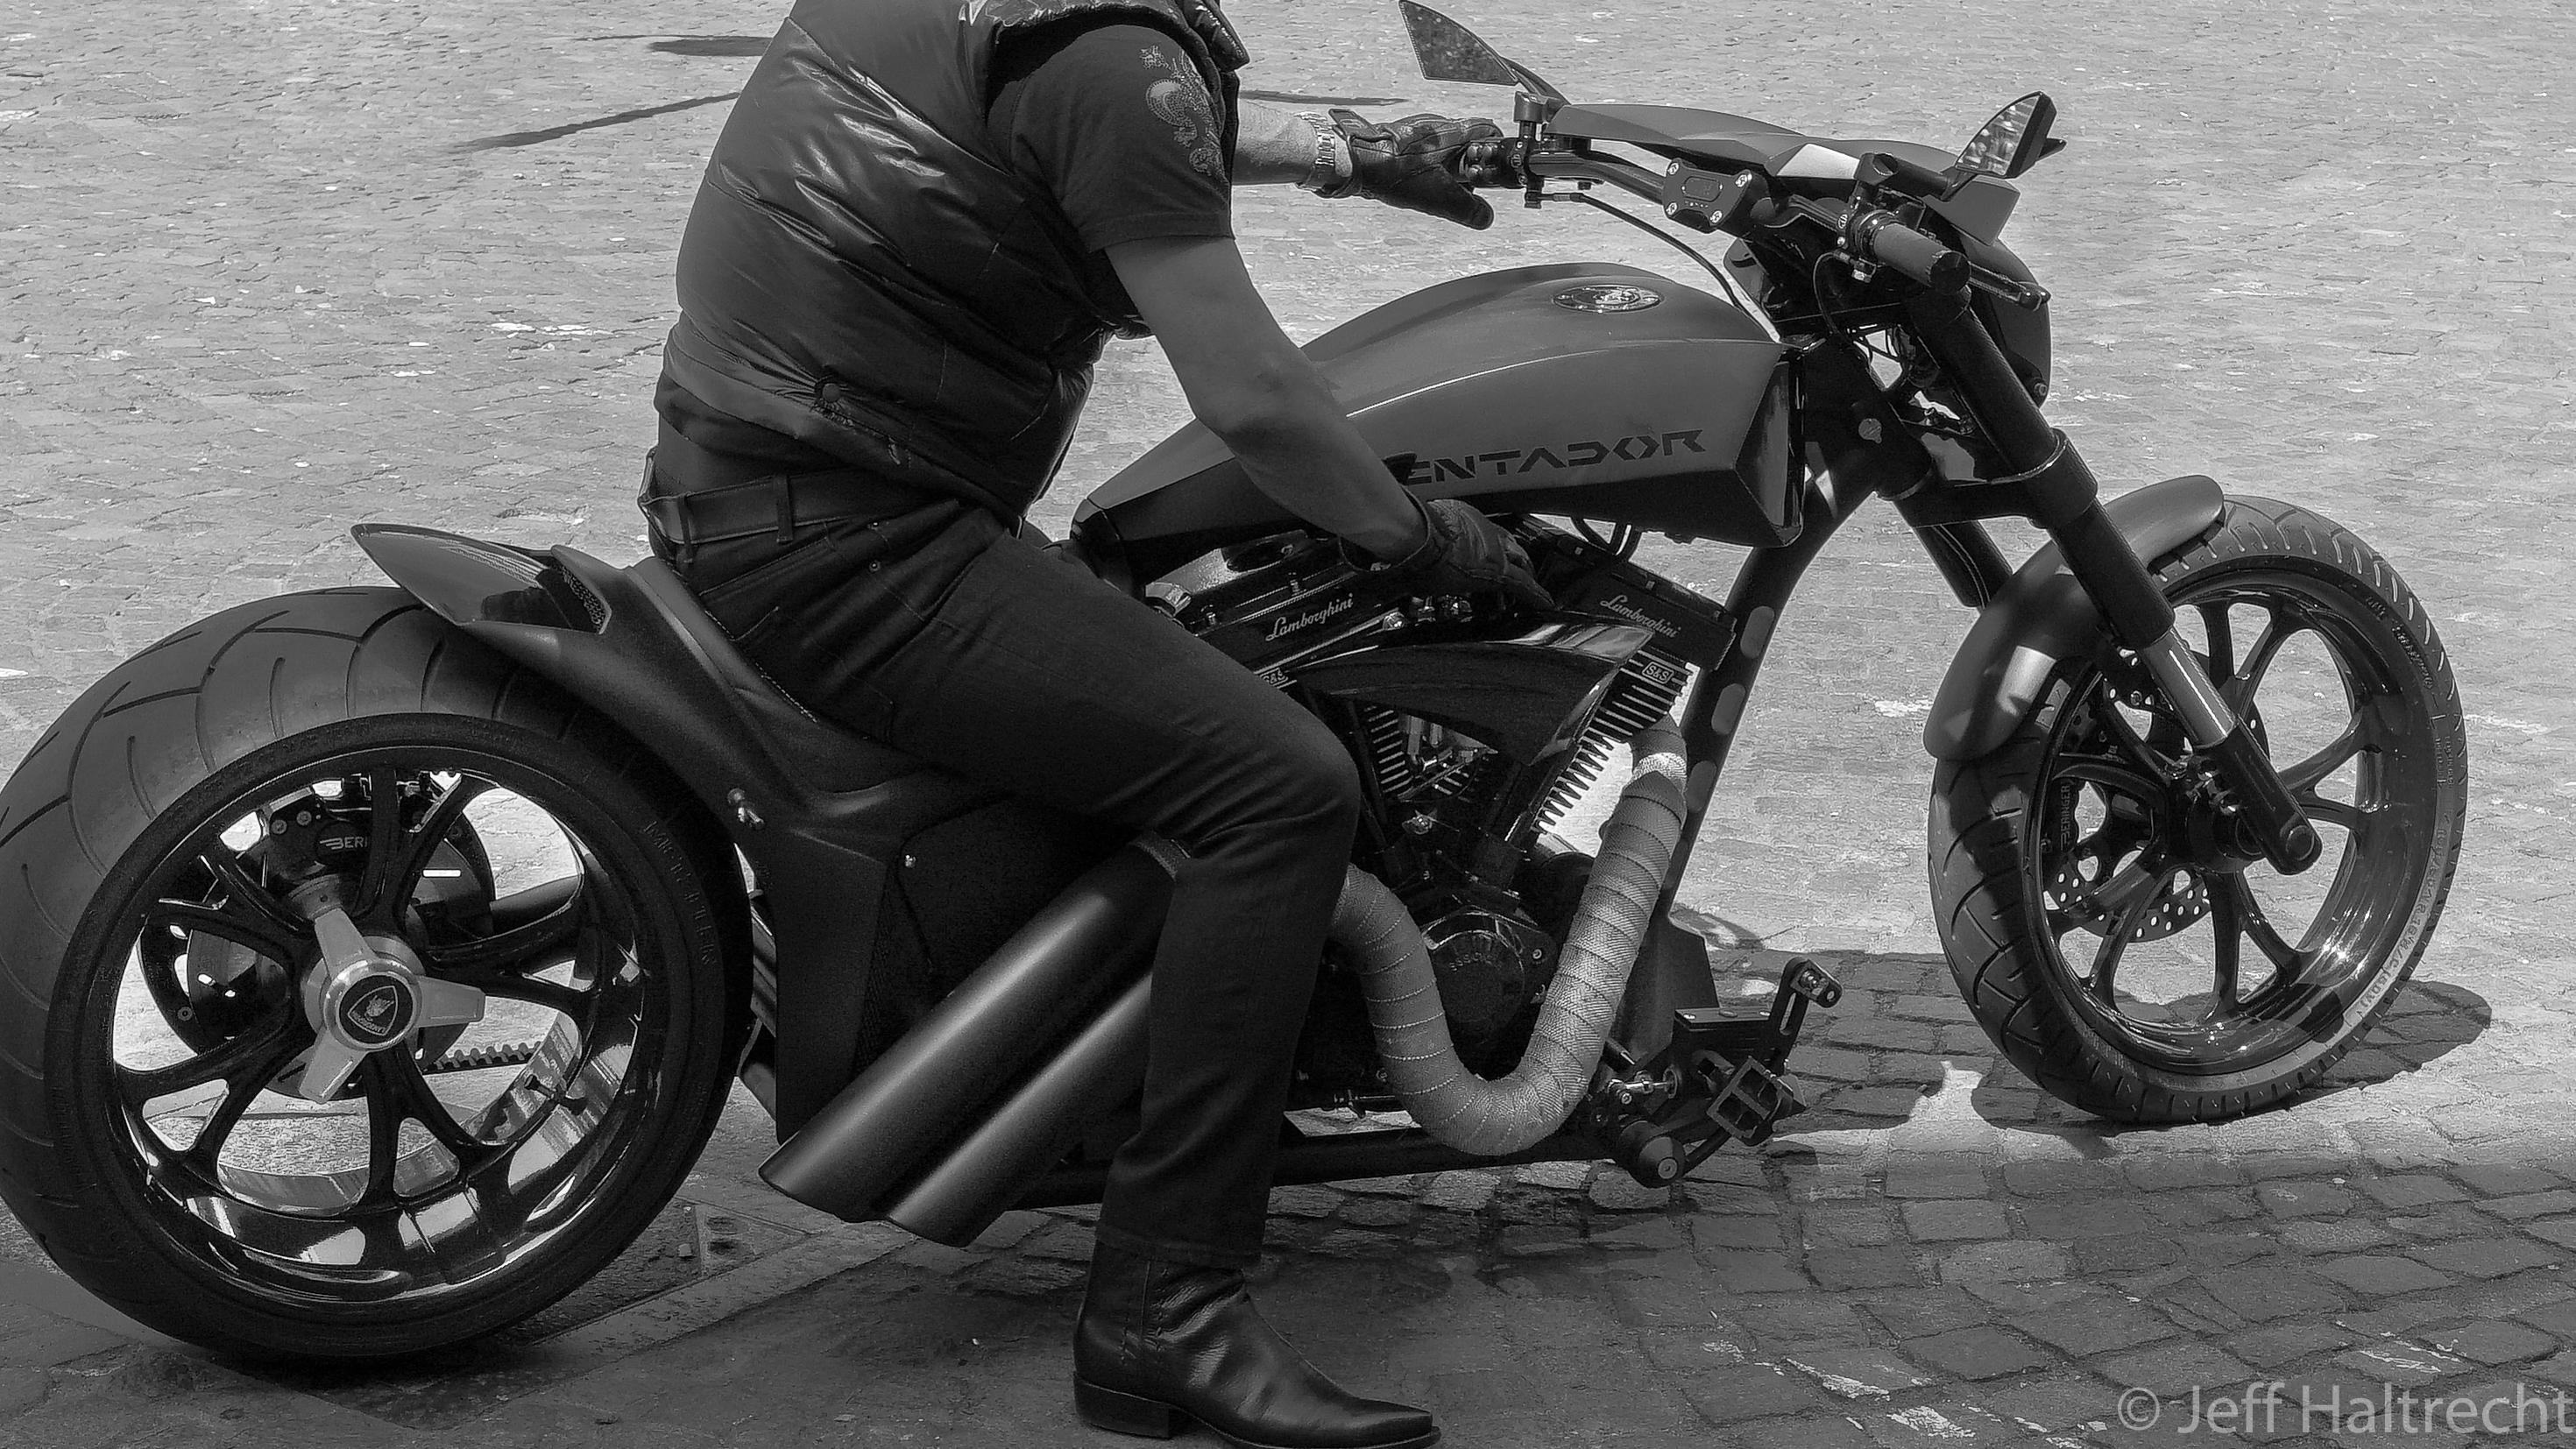 lamborghini aventador motorcycle one of a kind frankfurt